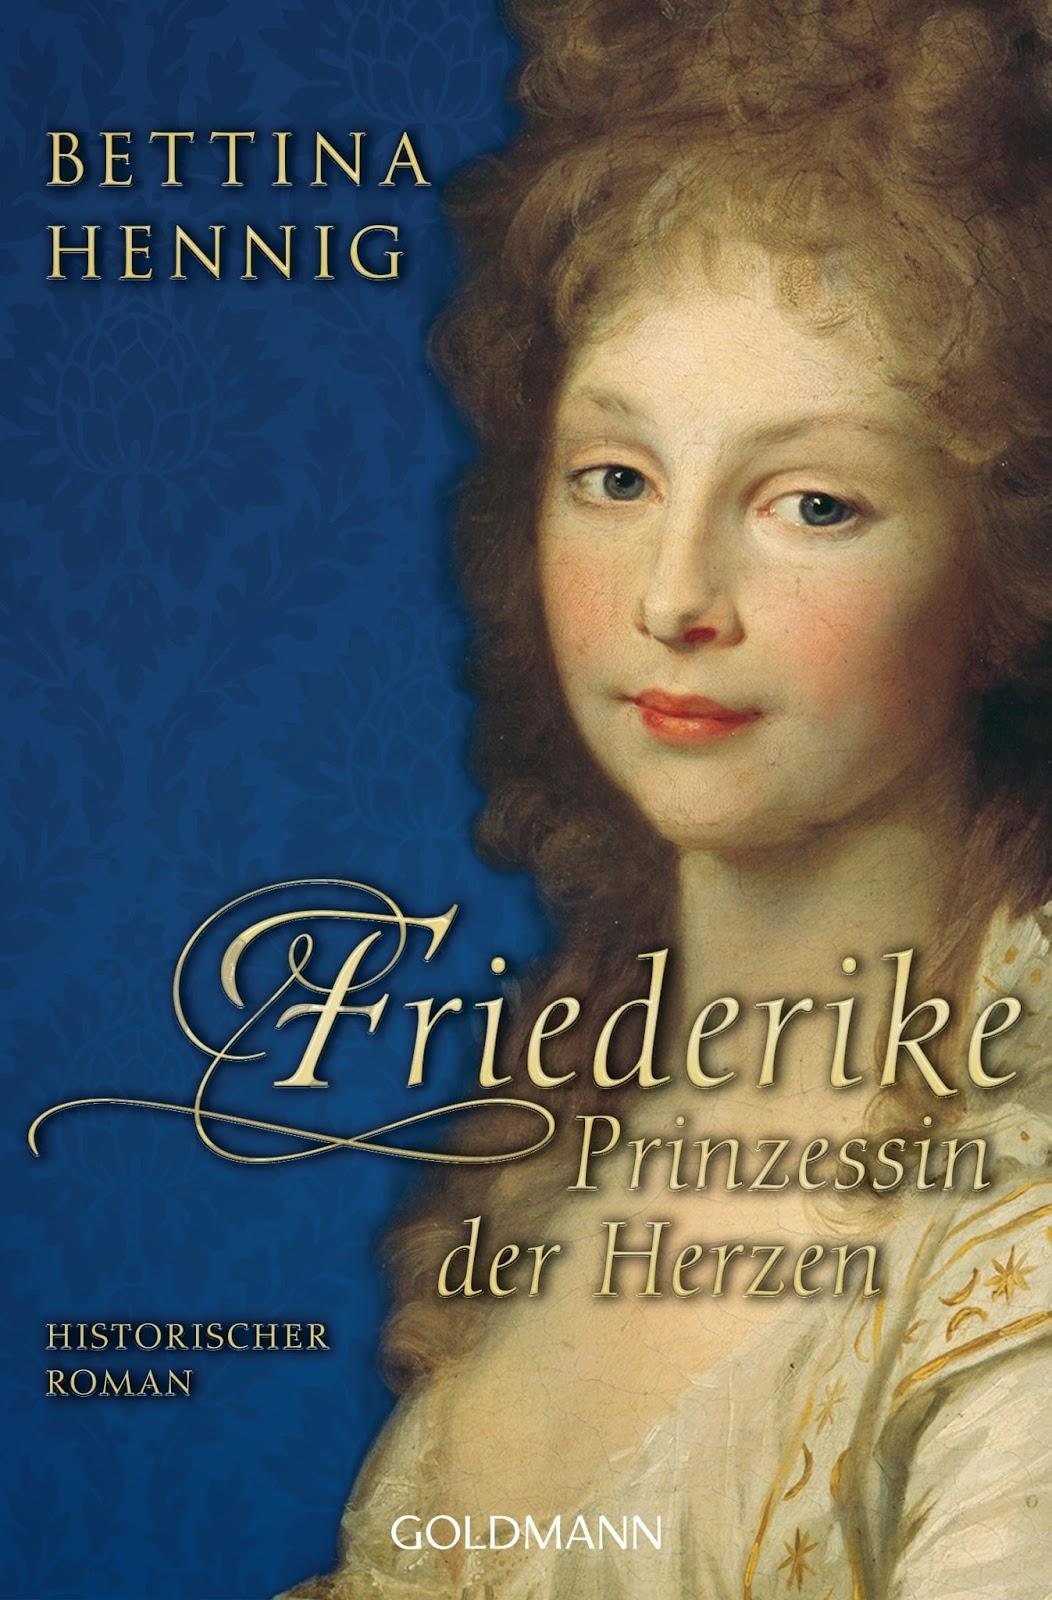 http://www.amazon.de/Friederike-Prinzessin-Herzen-Historischer-Roman/dp/3442480221/ref=sr_1_1_twi_1?ie=UTF8&qid=1422724148&sr=8-1&keywords=friederike+prinzessin+der+herzen